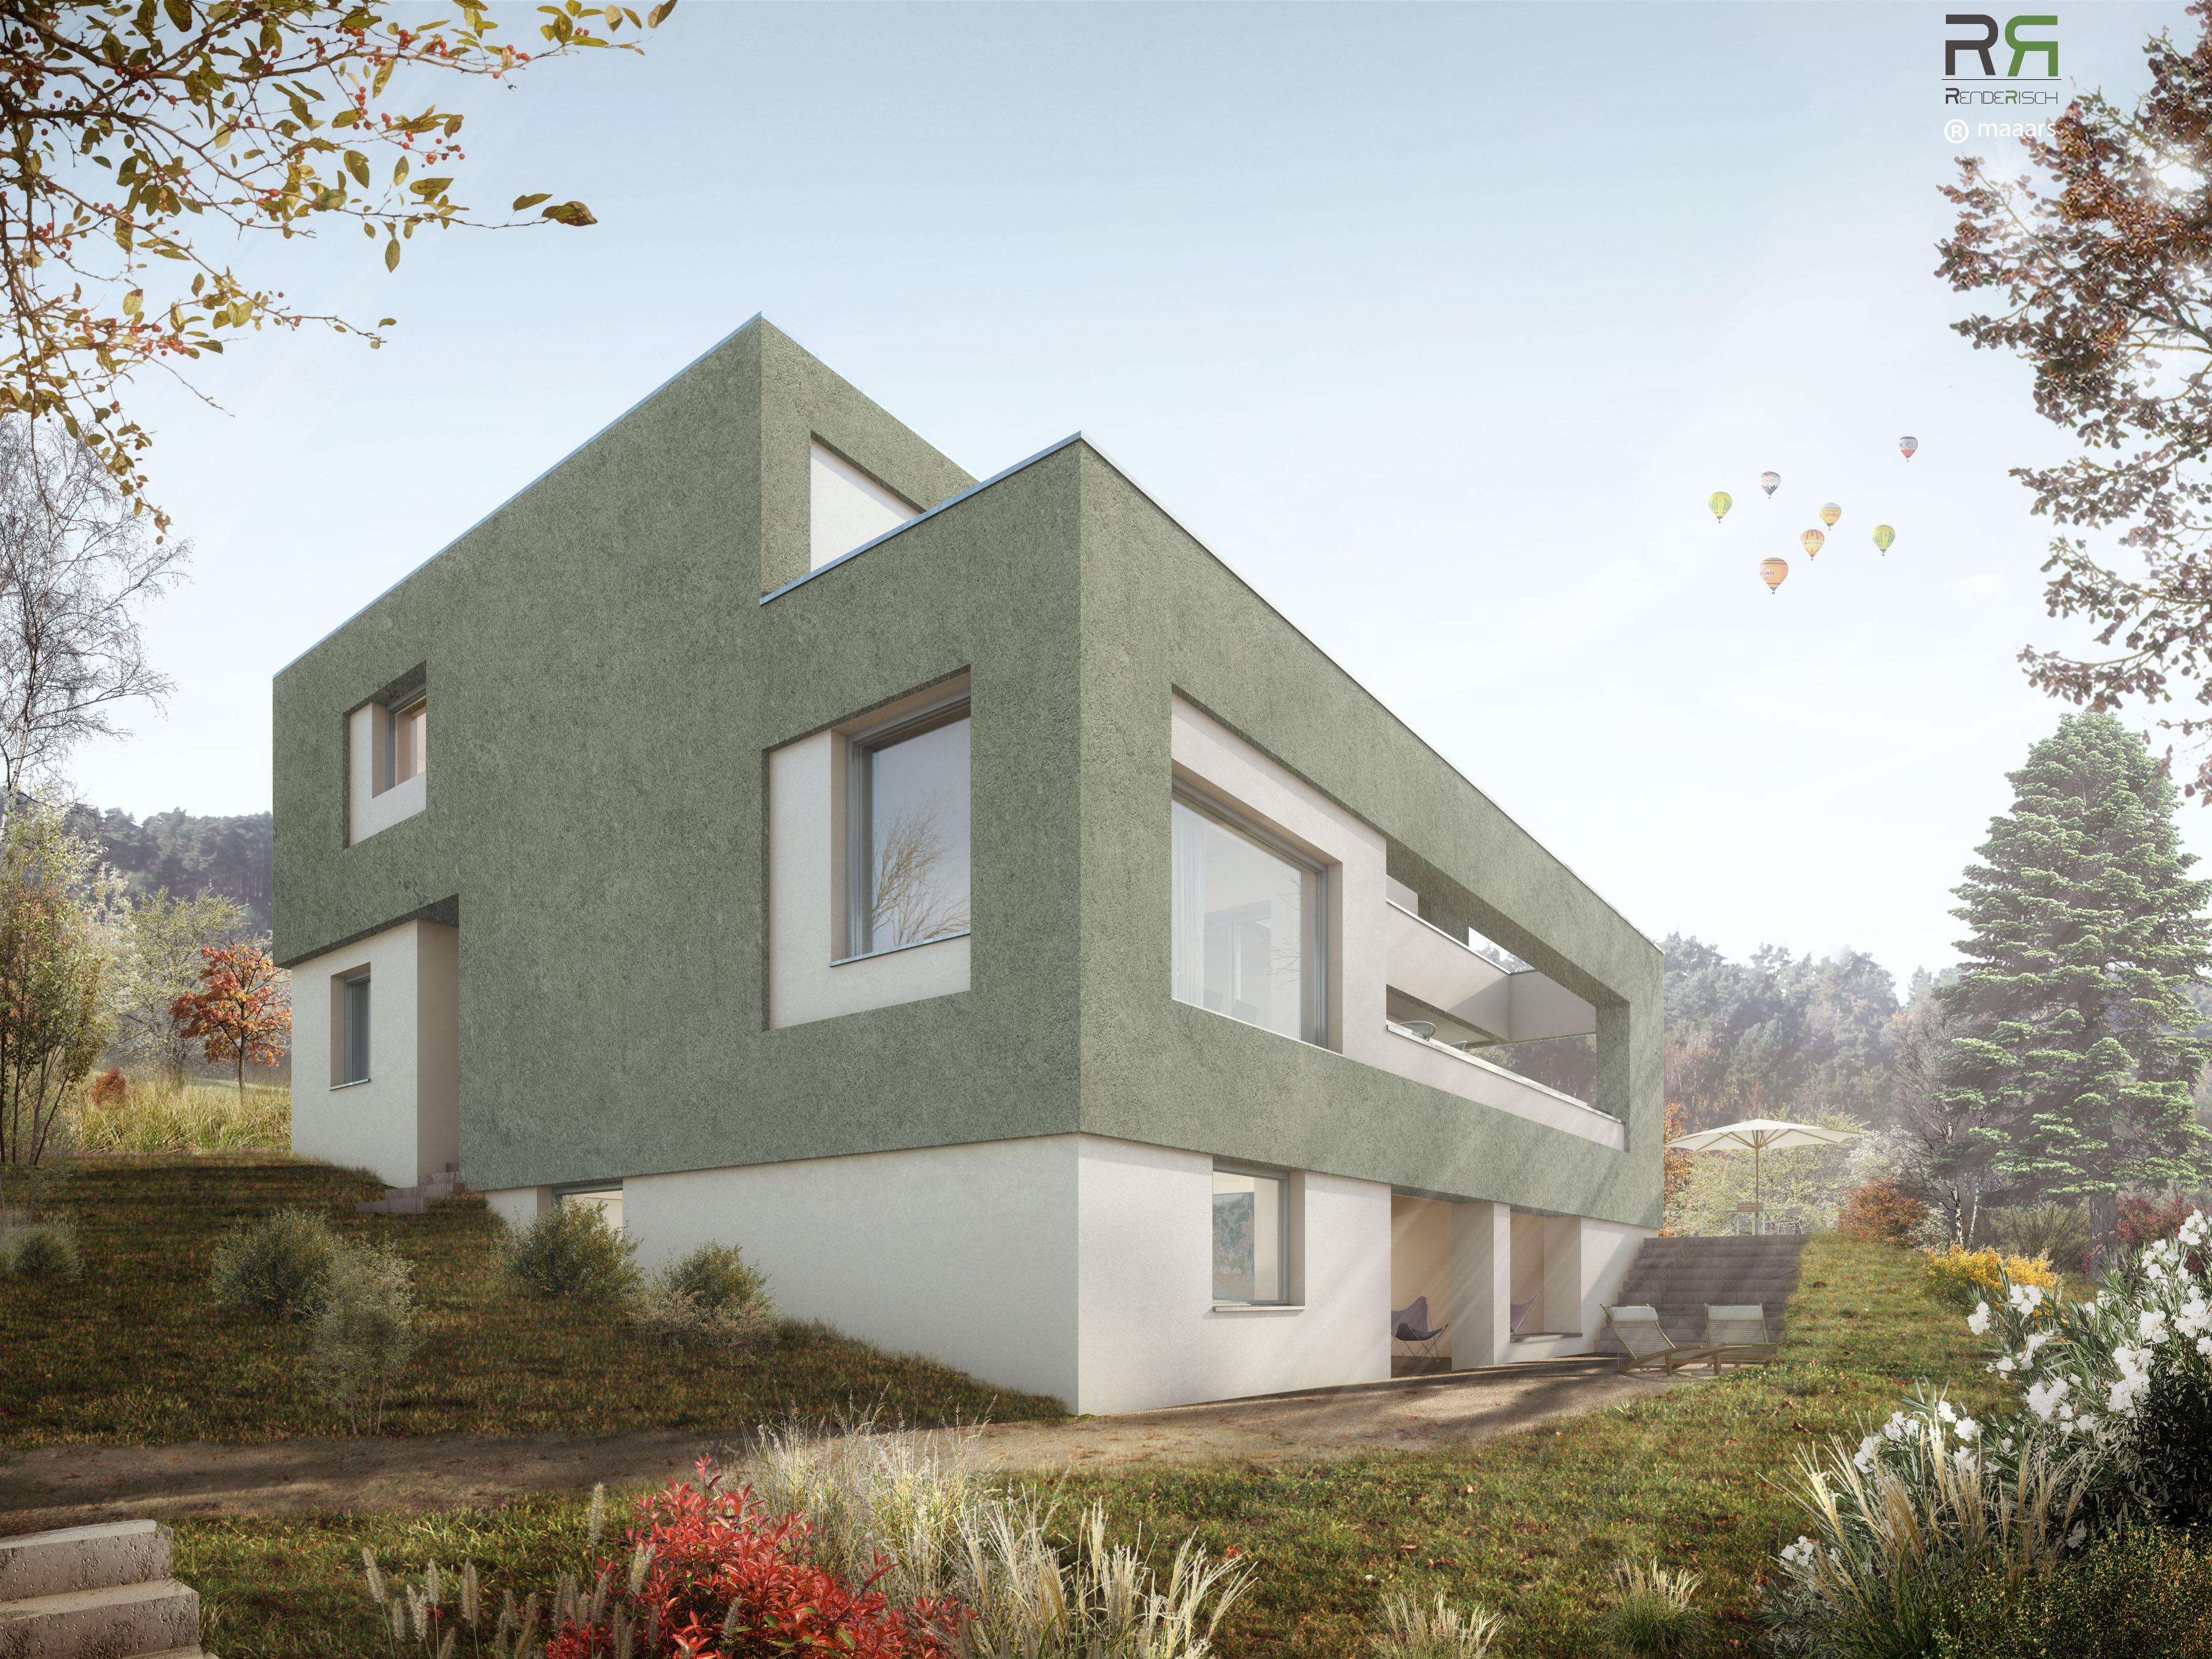 wild bär heule – bergstraße Image